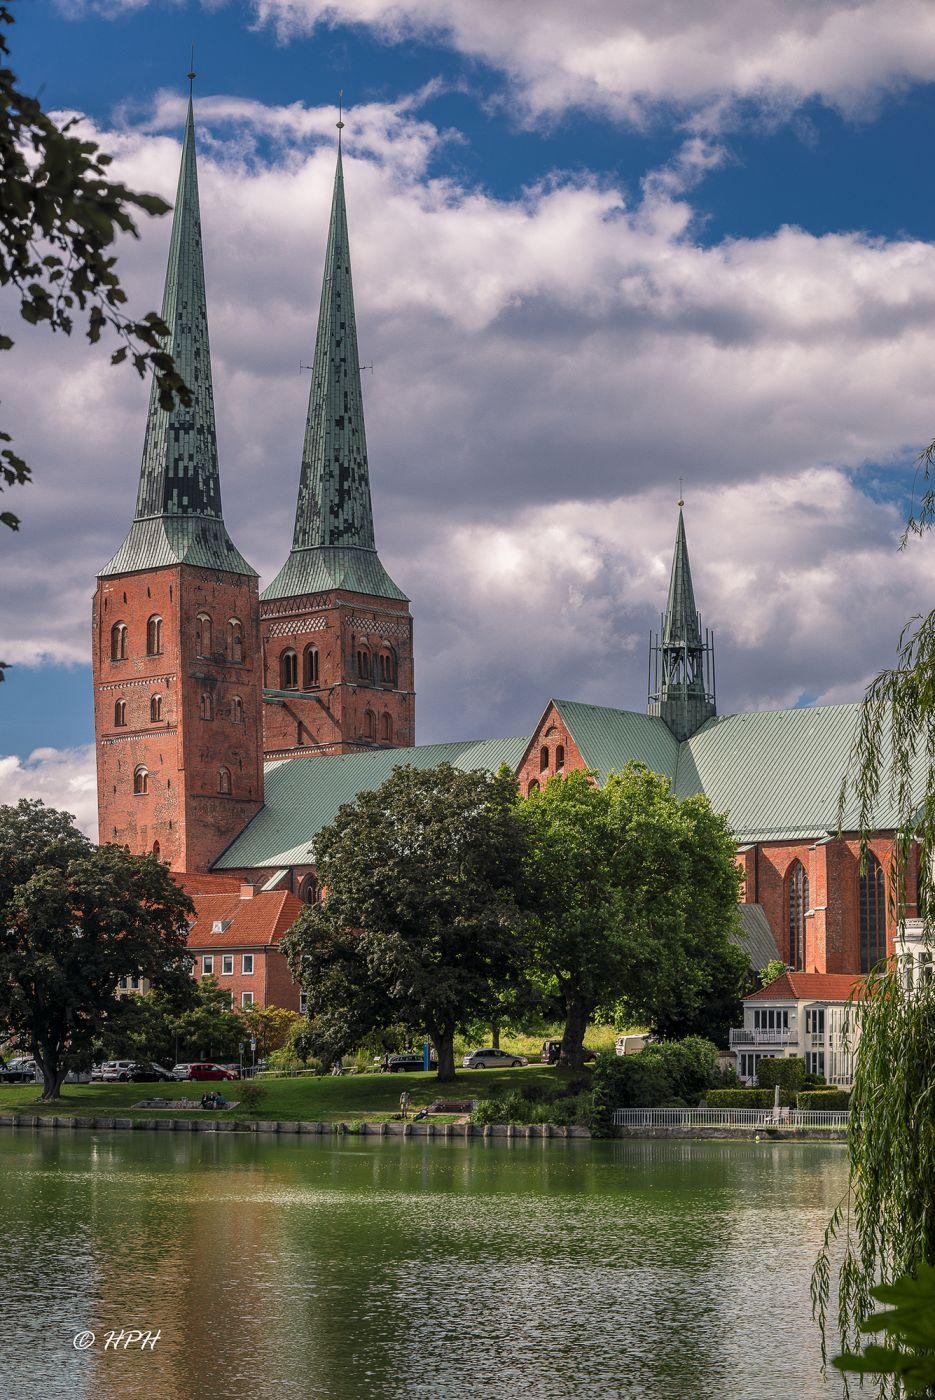 Mühlenteich Lübeck, Germany